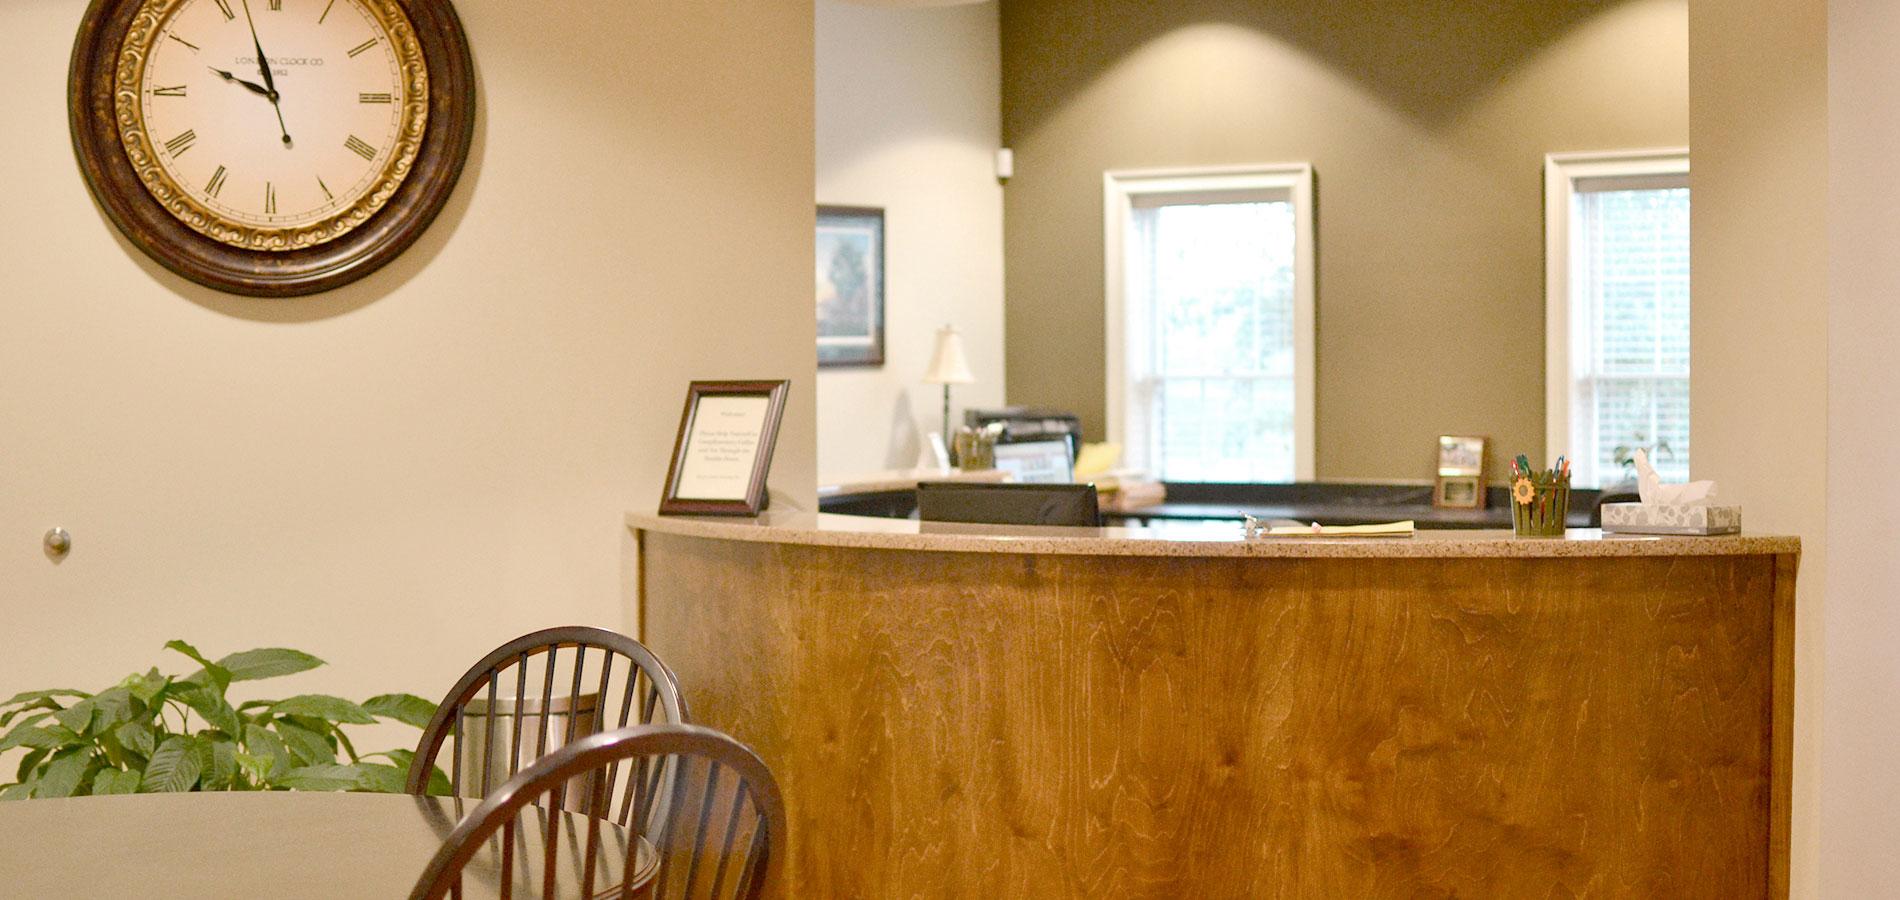 General, Cosmetic & Restorative Dentistry In Seneca, SC